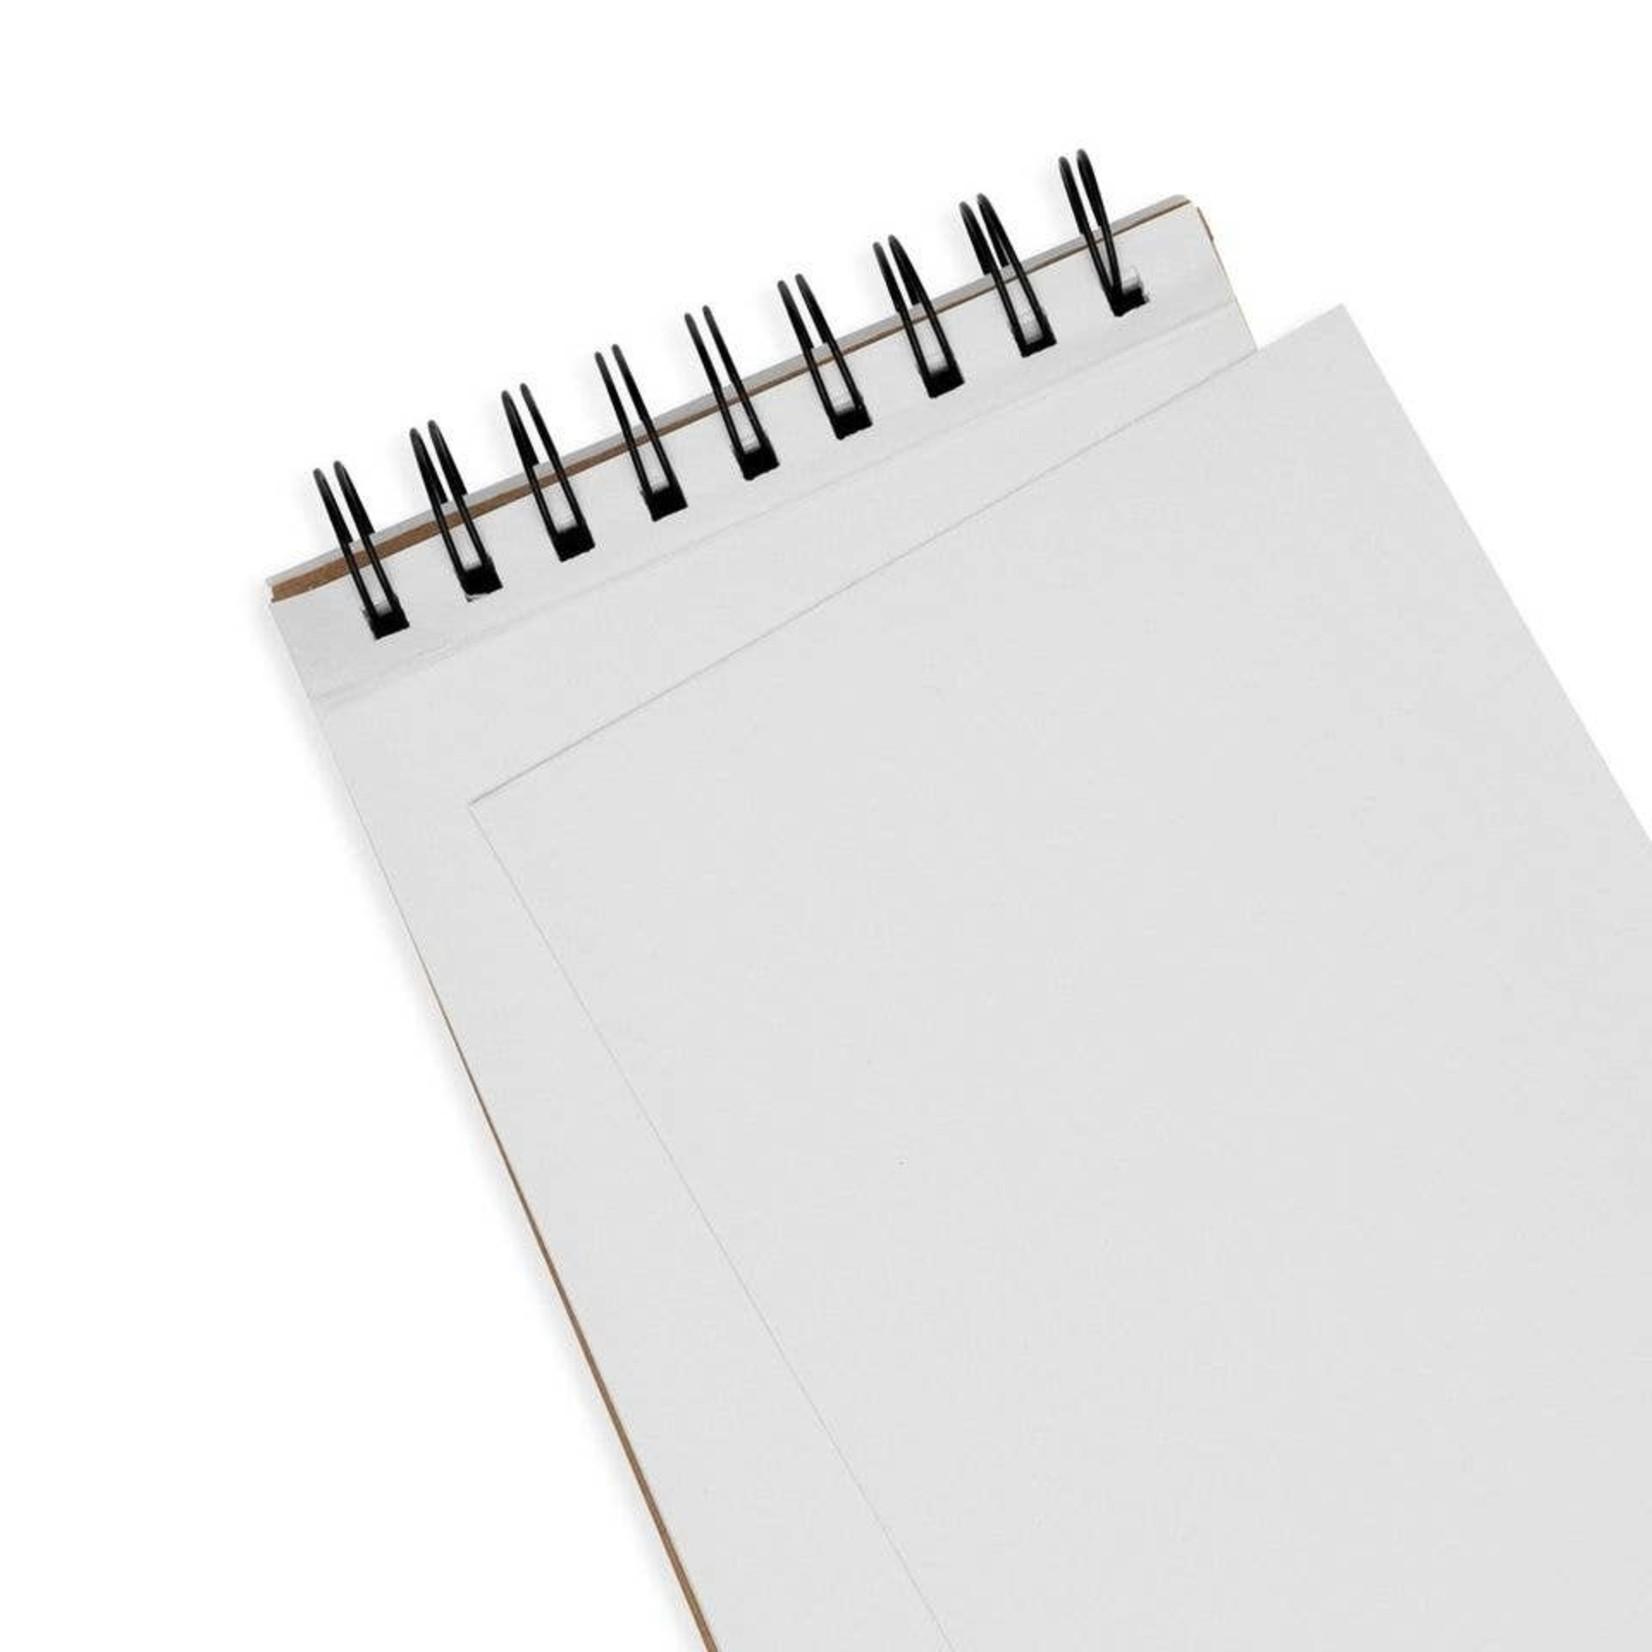 OOLY White Paper Sketchbook in 5x7